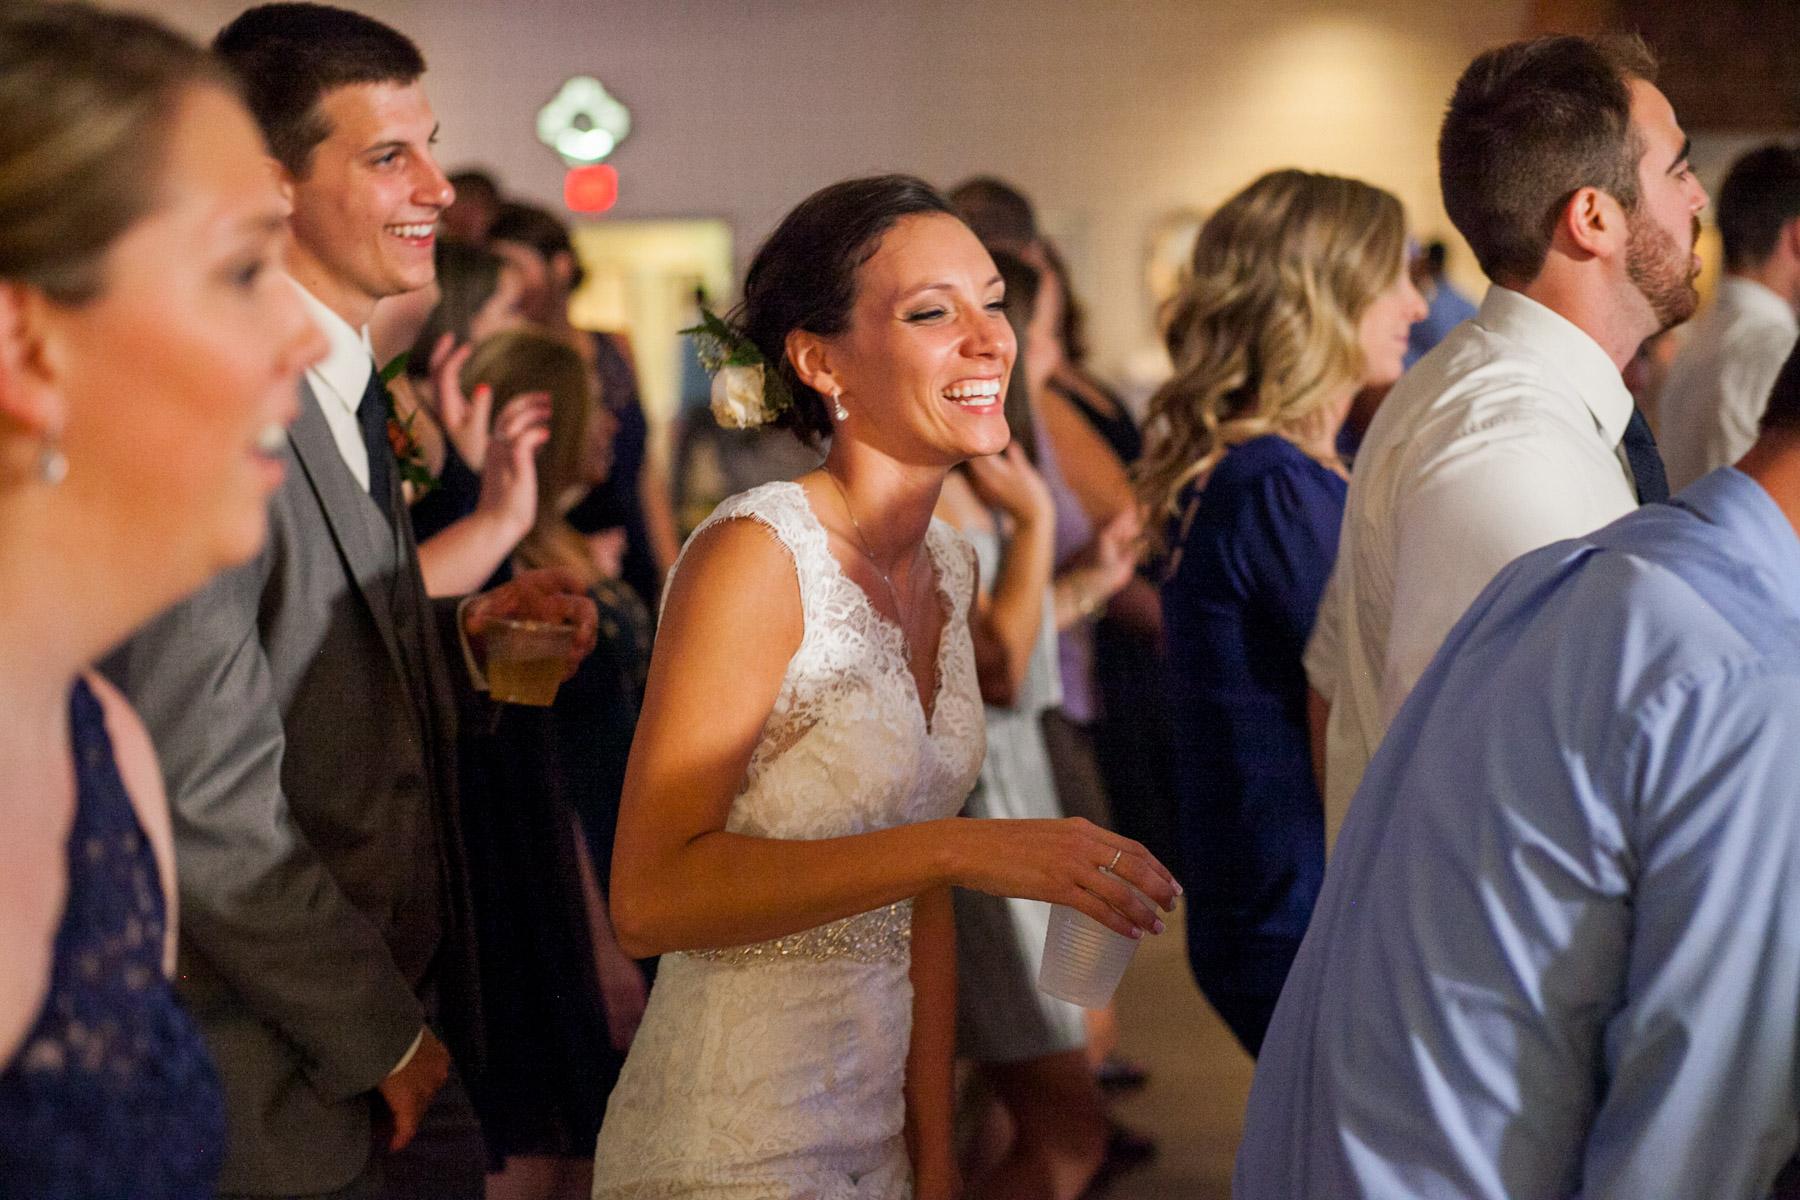 wildwood-park-wedding-photos-103.jpg